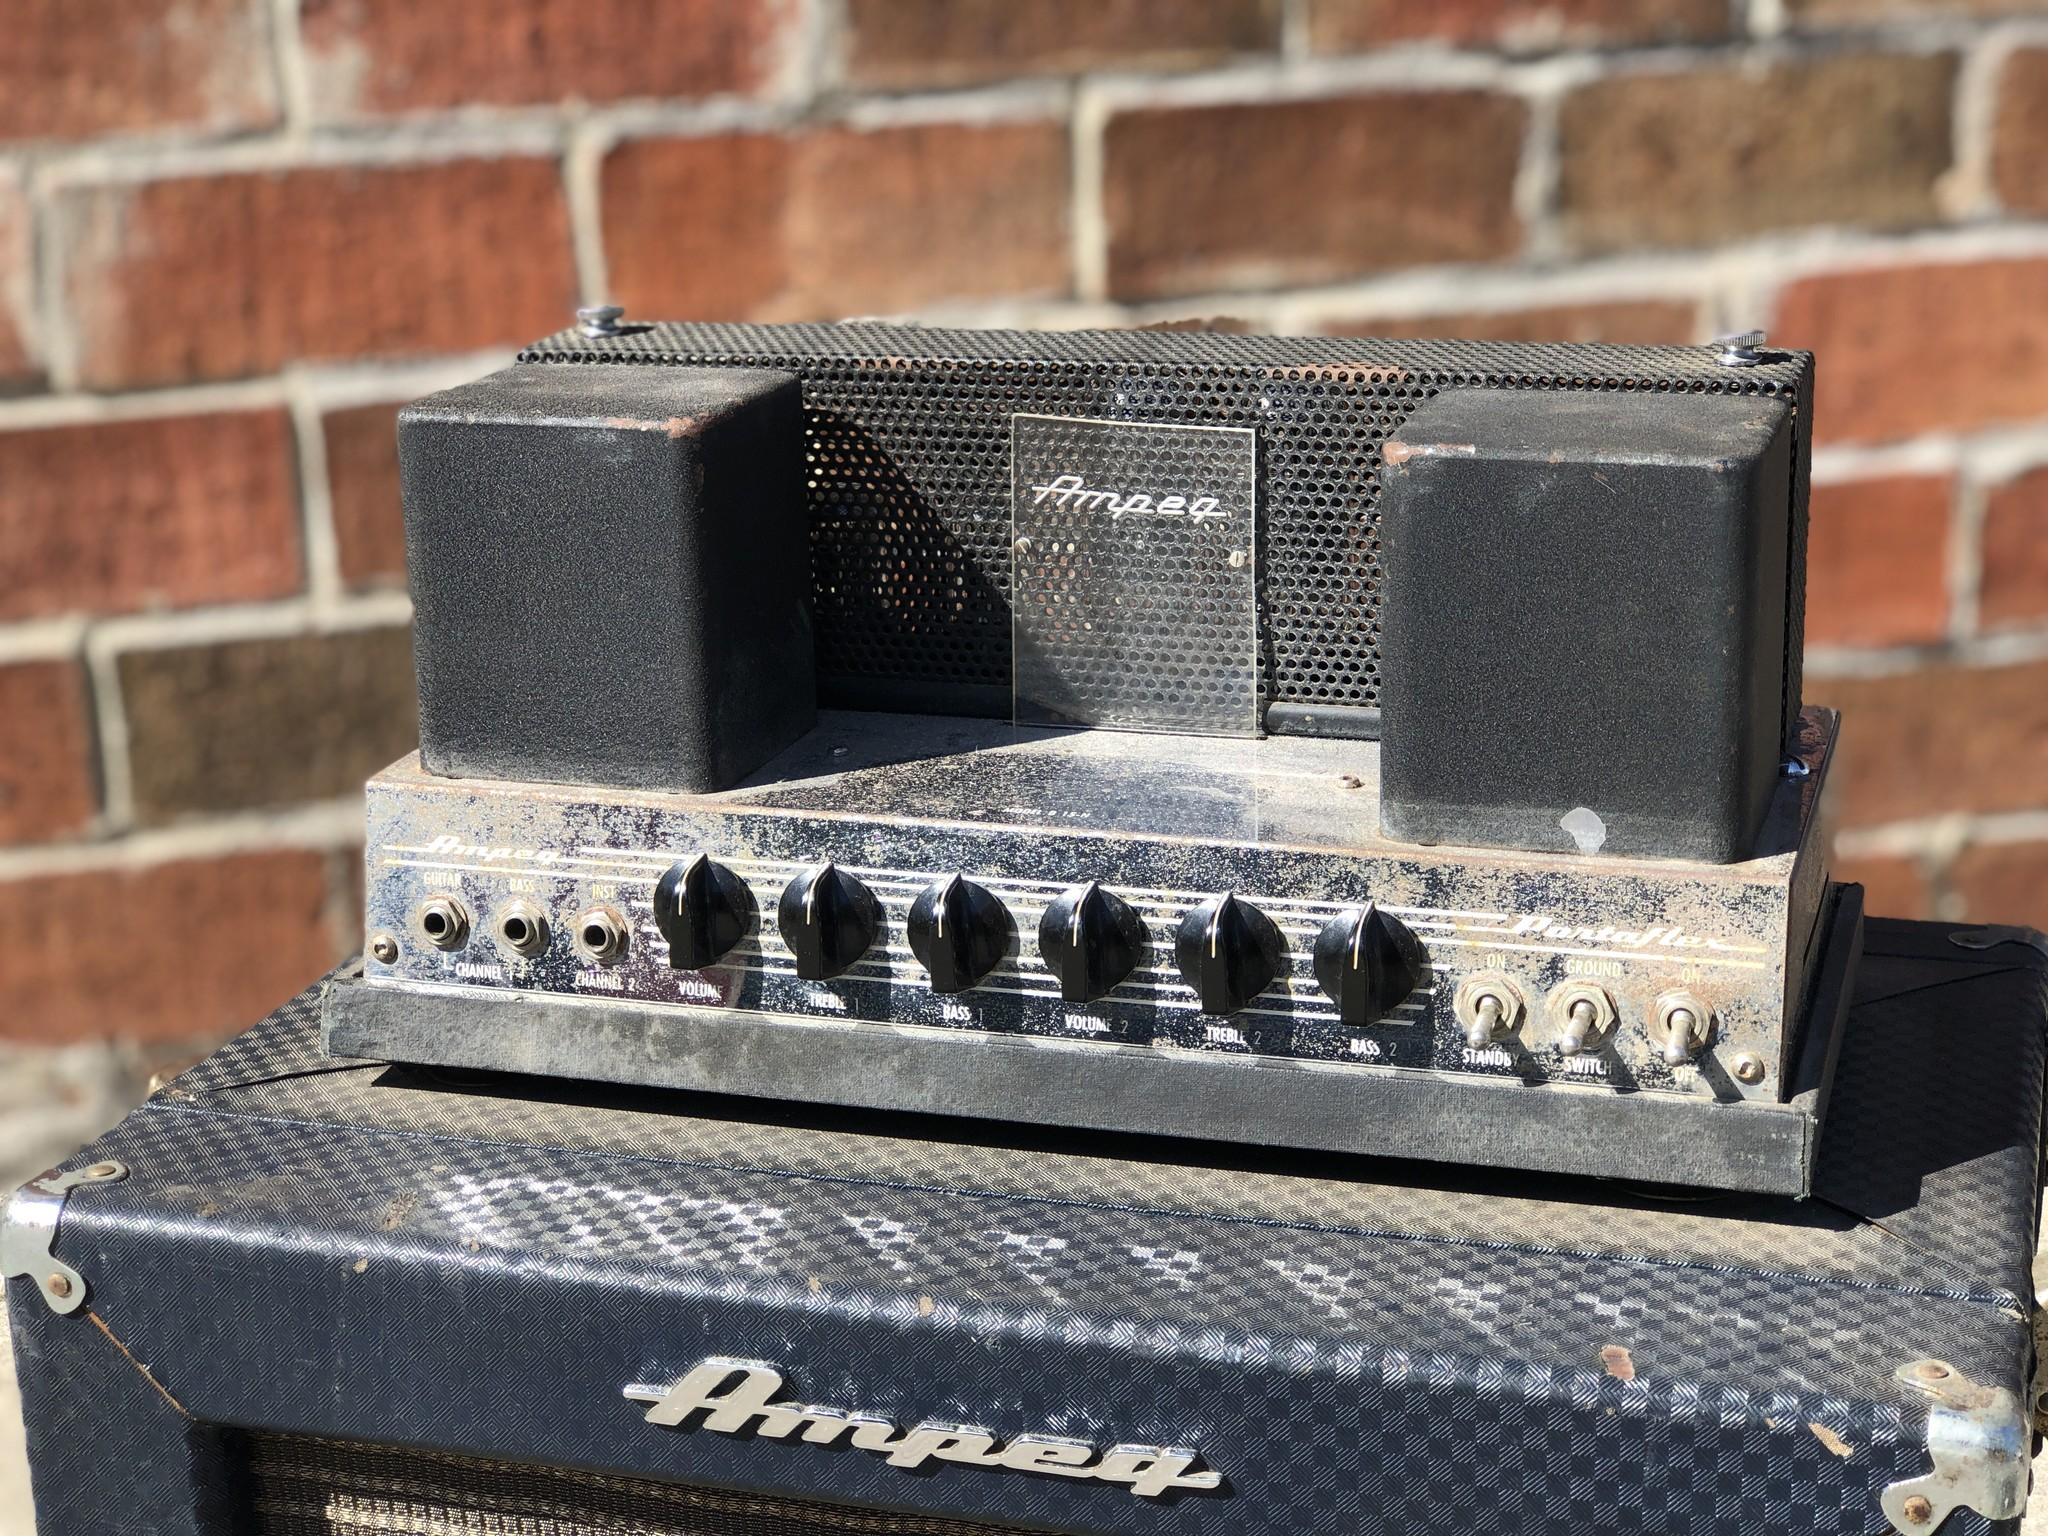 1966 Ampeg Portaflex B15-2